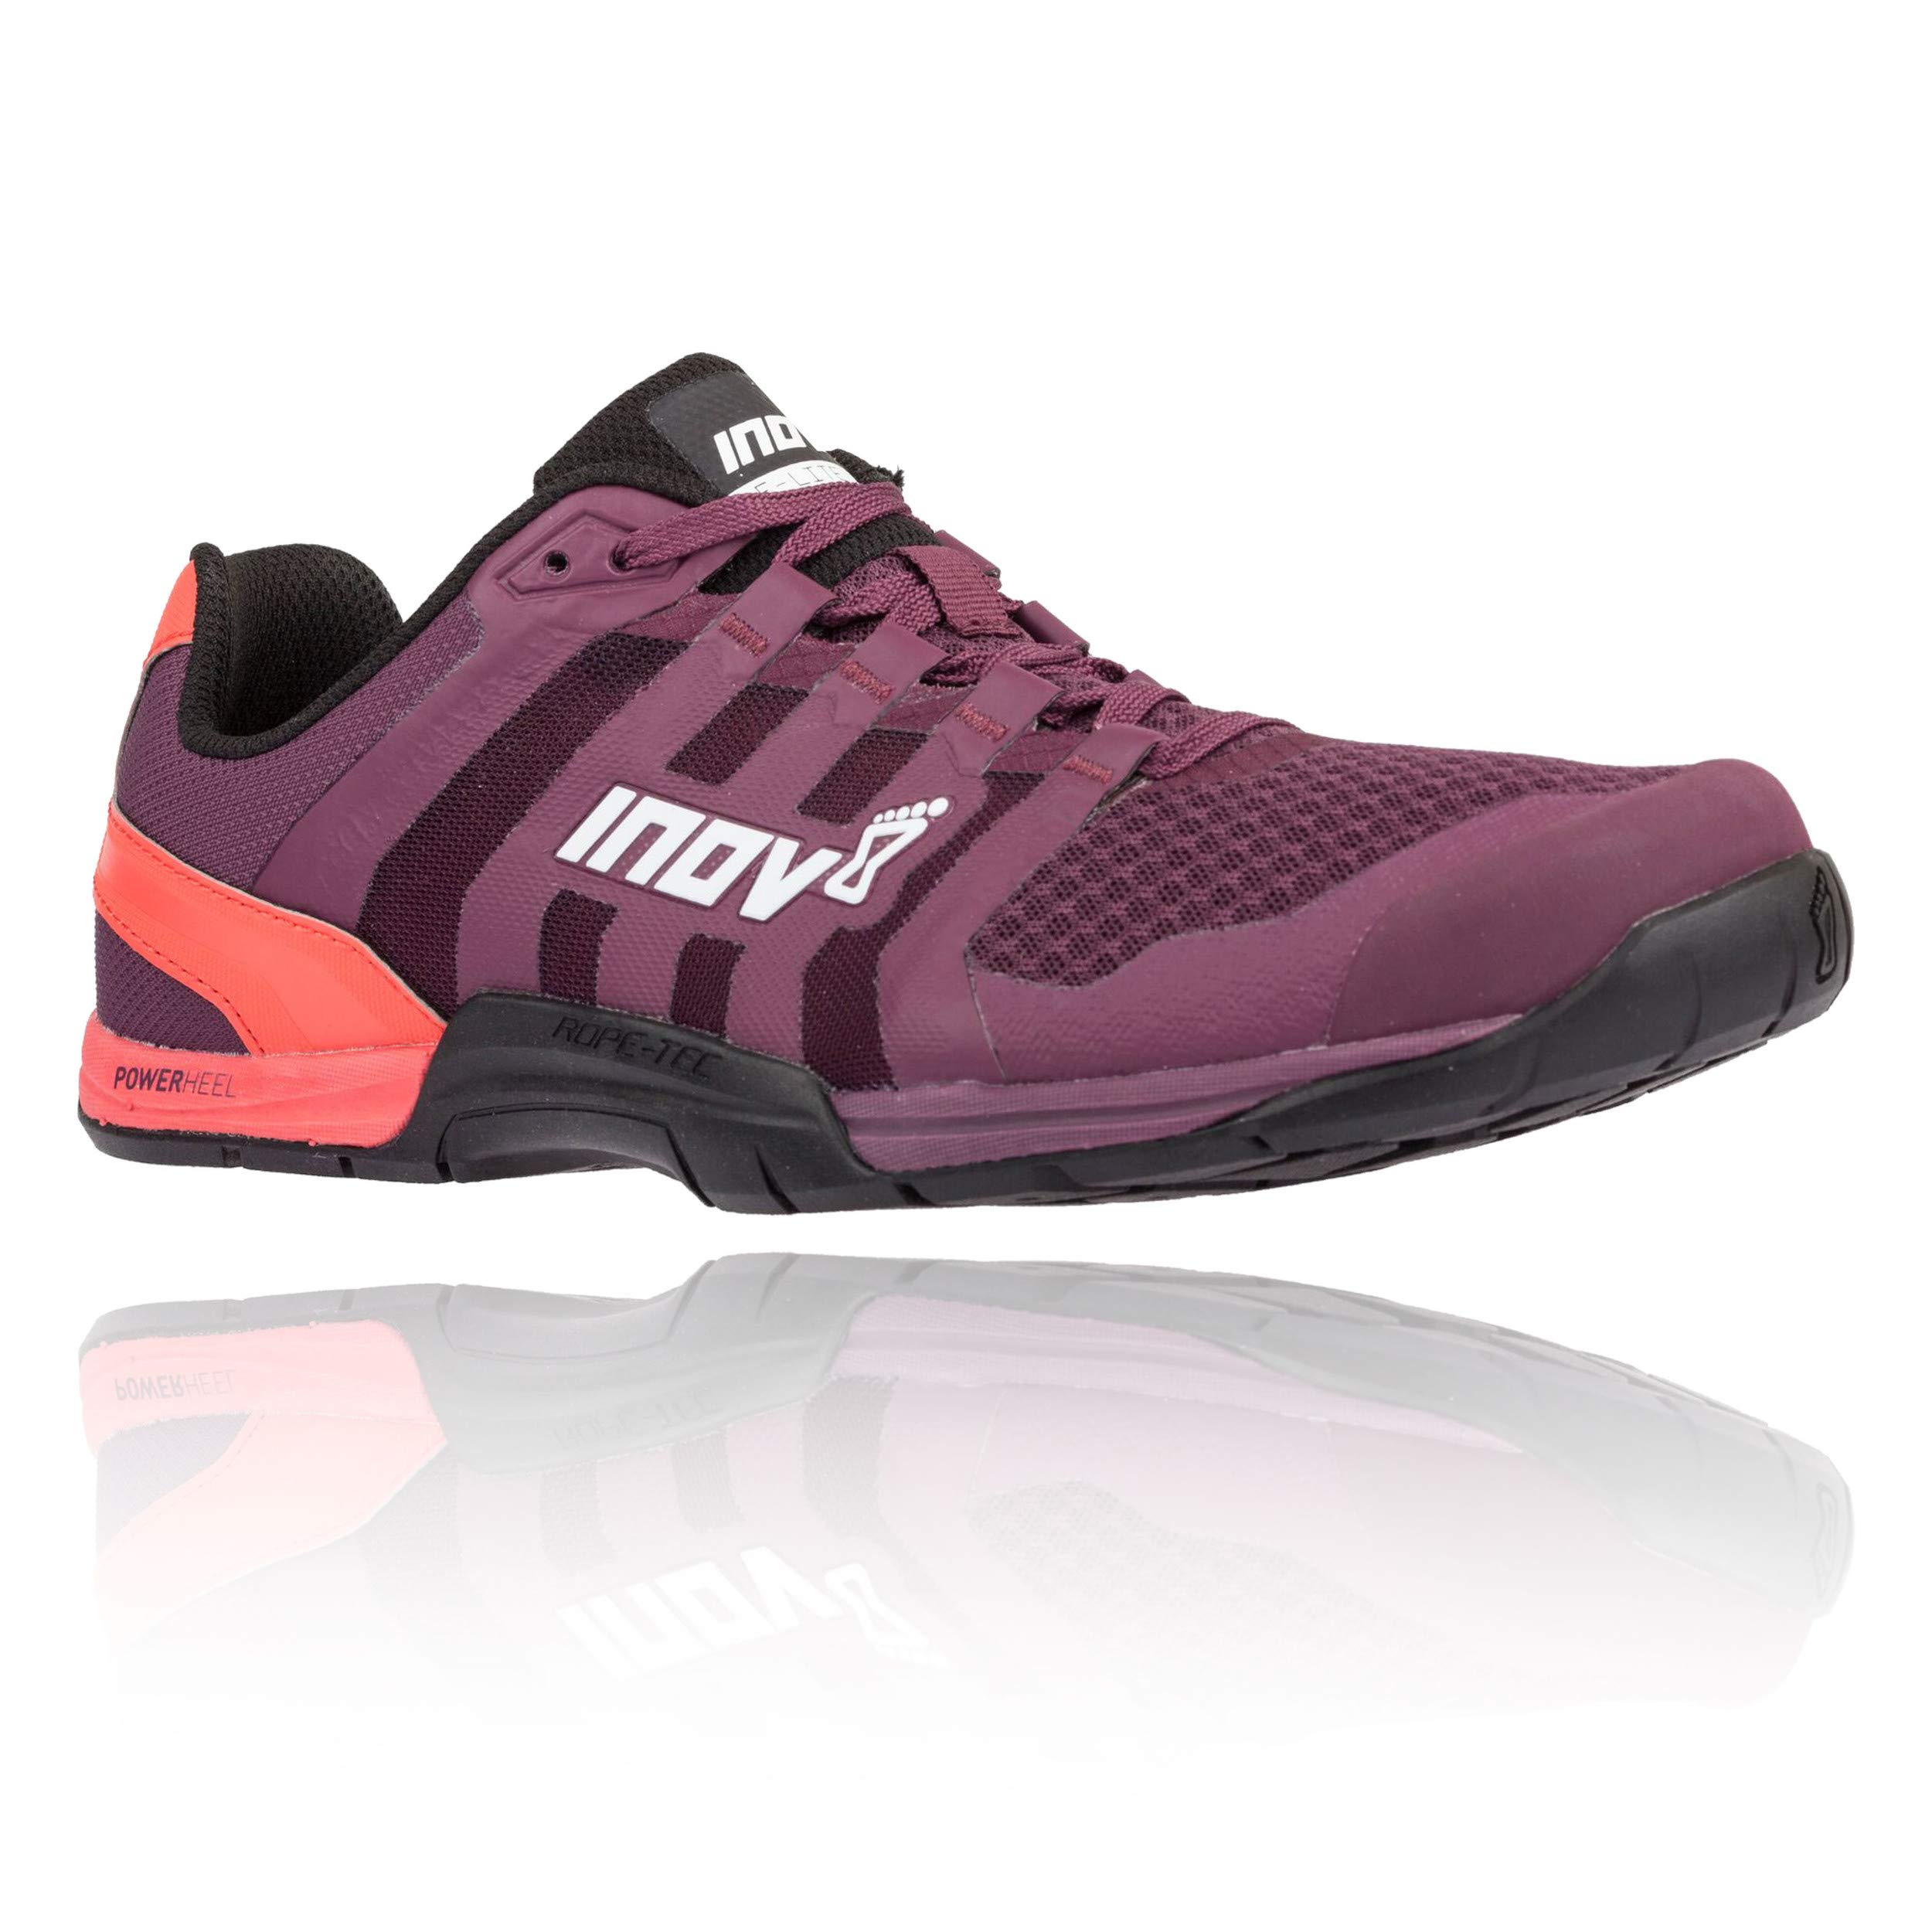 Inov-8 Women's F-Lite 235 V2 Purple/Coral 6.5 W UK Standard Fit (Wide) by Inov-8